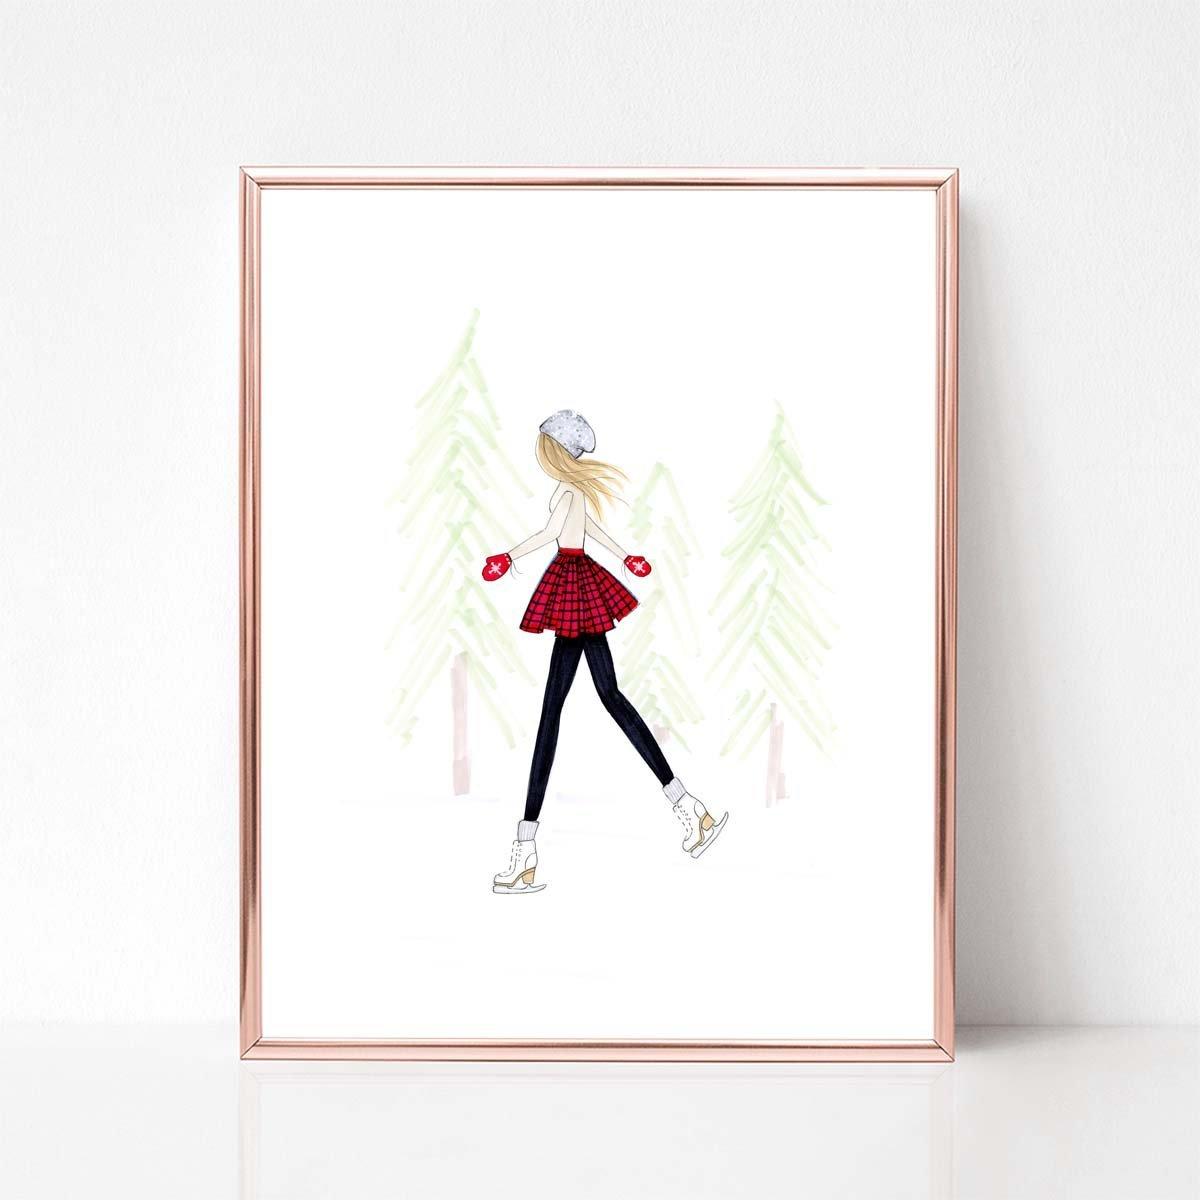 Customizable Hair Color Winter Skater Fashion Illustration Art Print